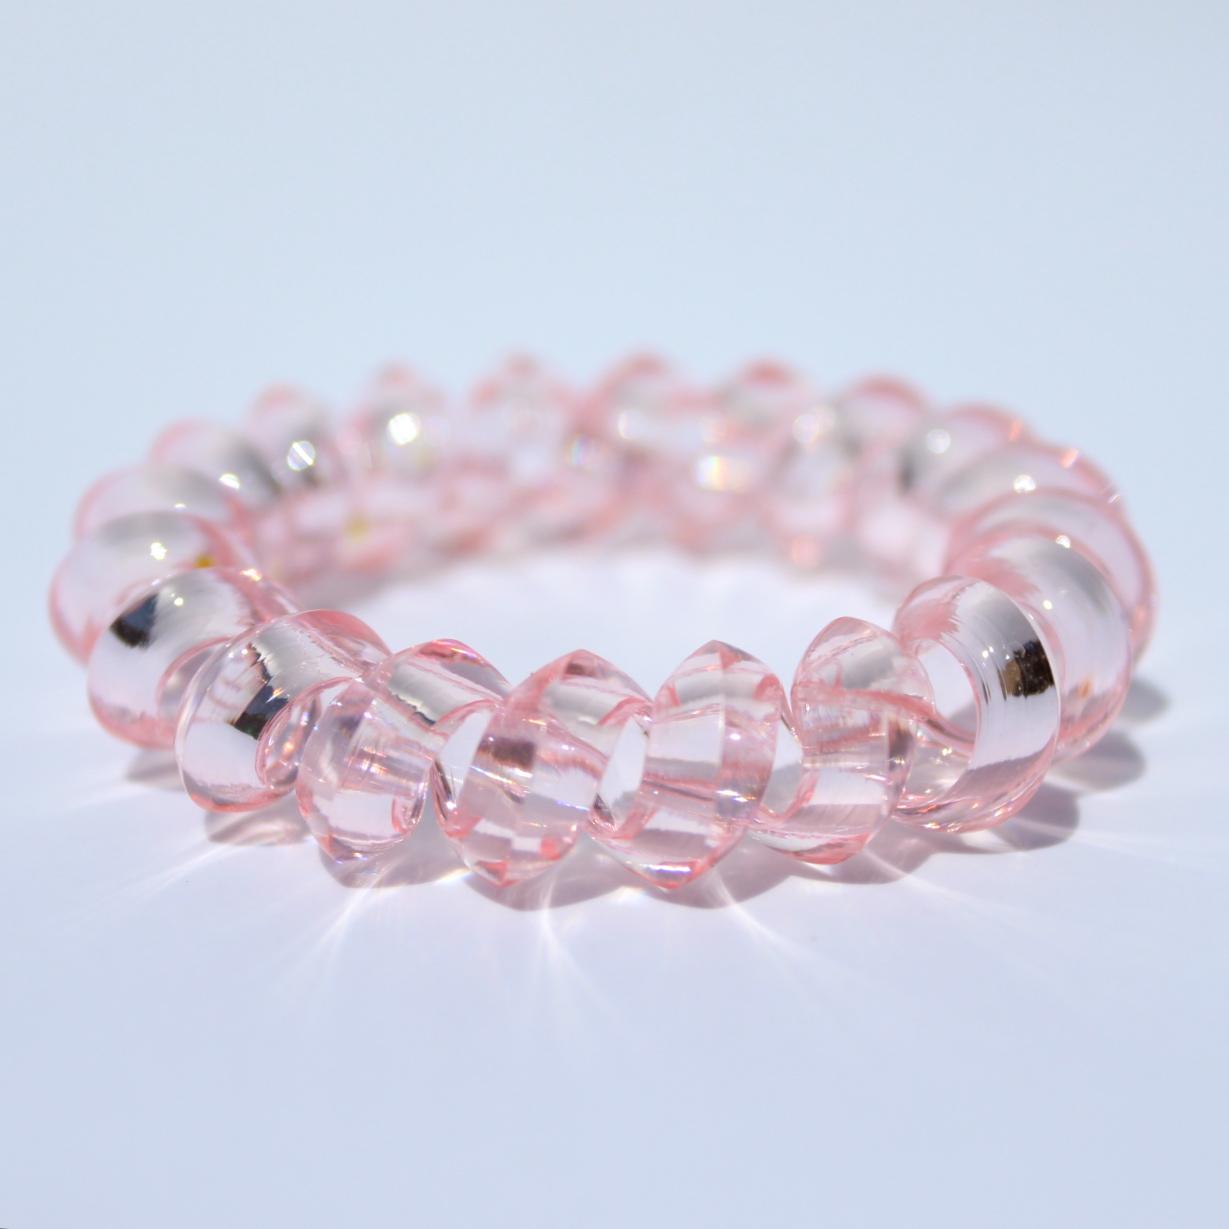 Bledoružová gumička do vlasov Hairfix - Crystal Špicaté Light Pink 1